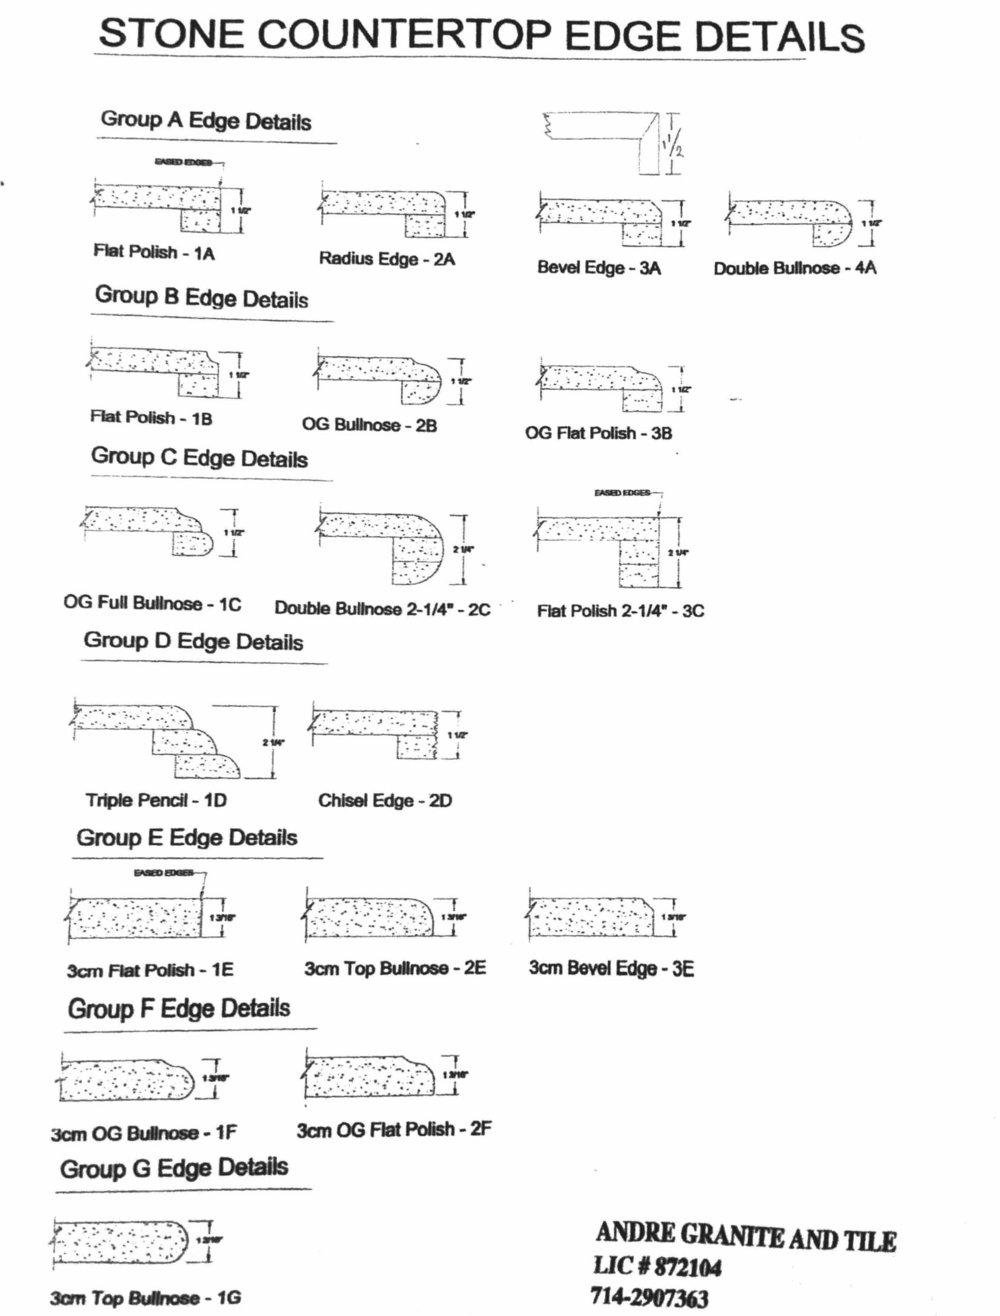 2017-12-20 10-51_page_1-1.jpg